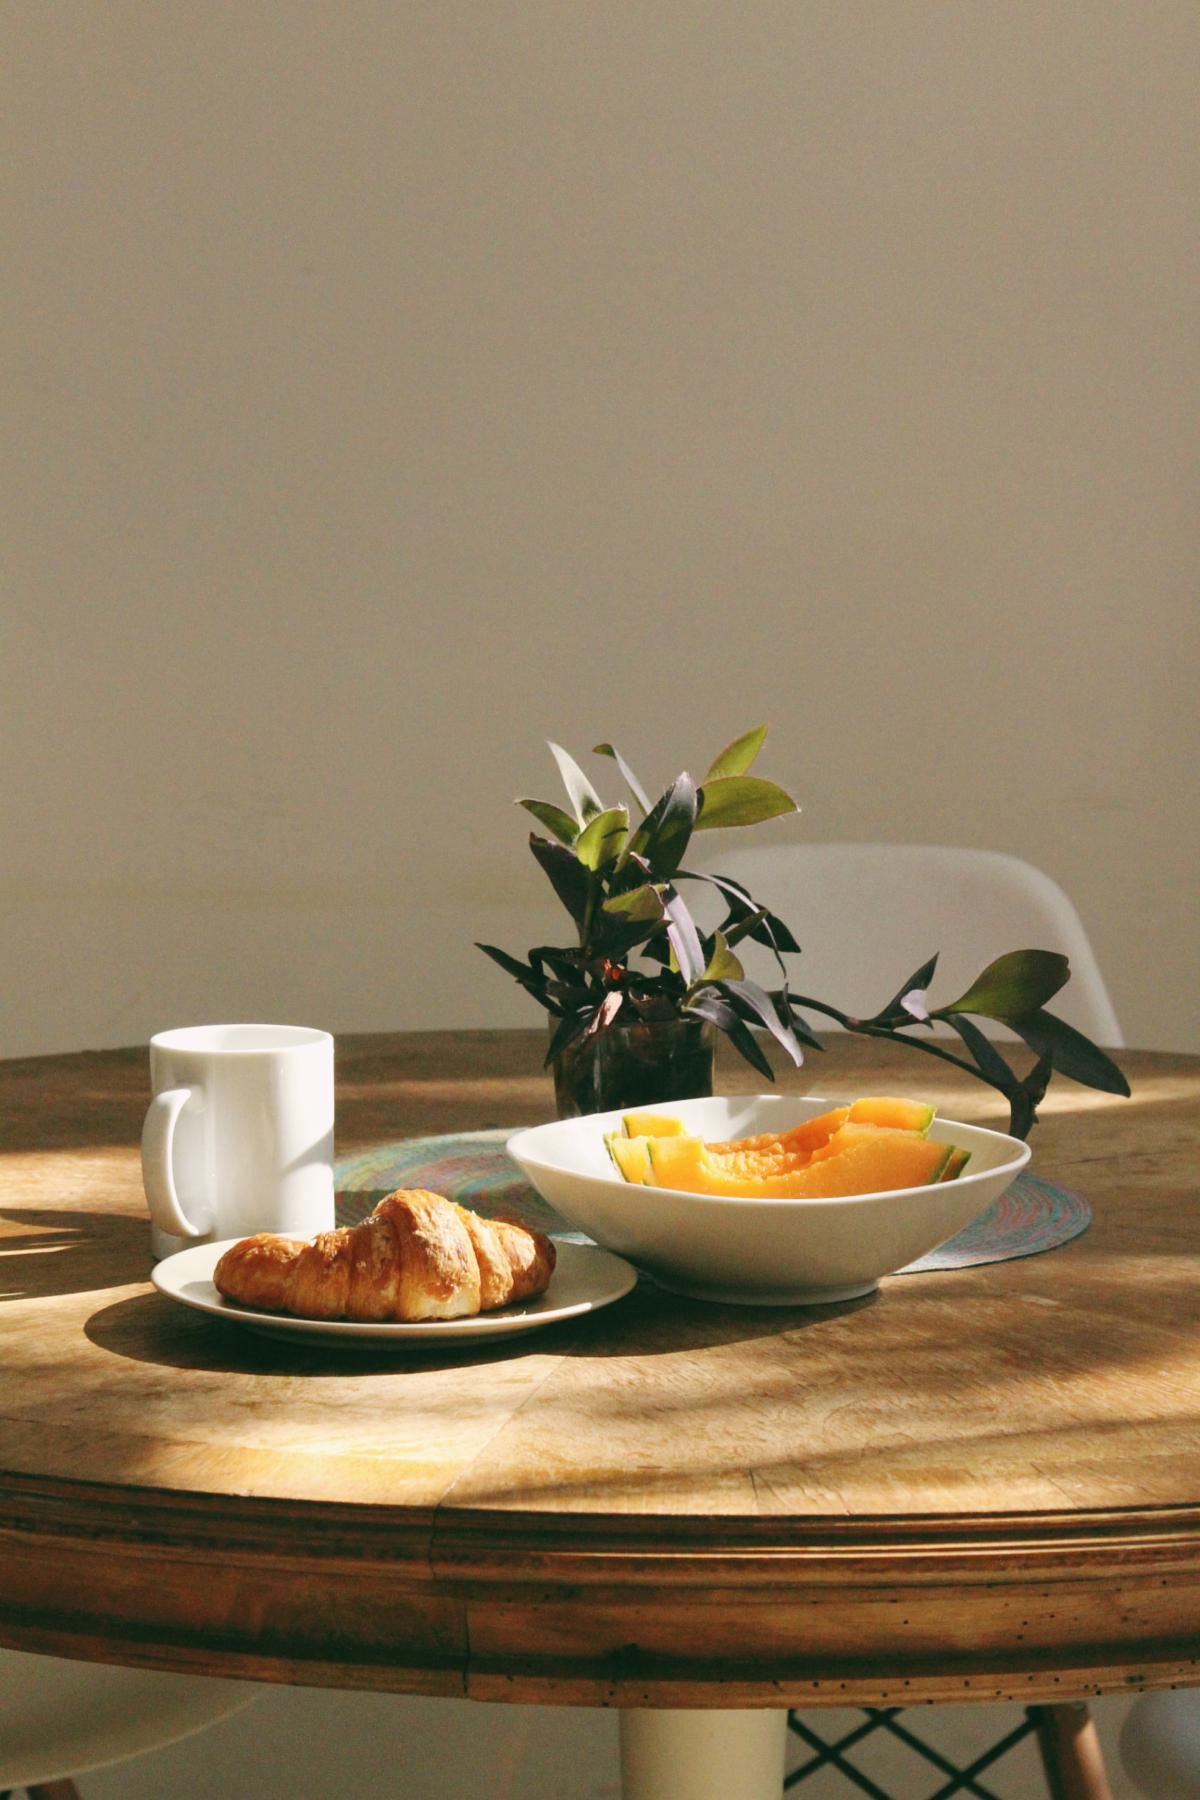 Croissant Bread Beside Mug #423366